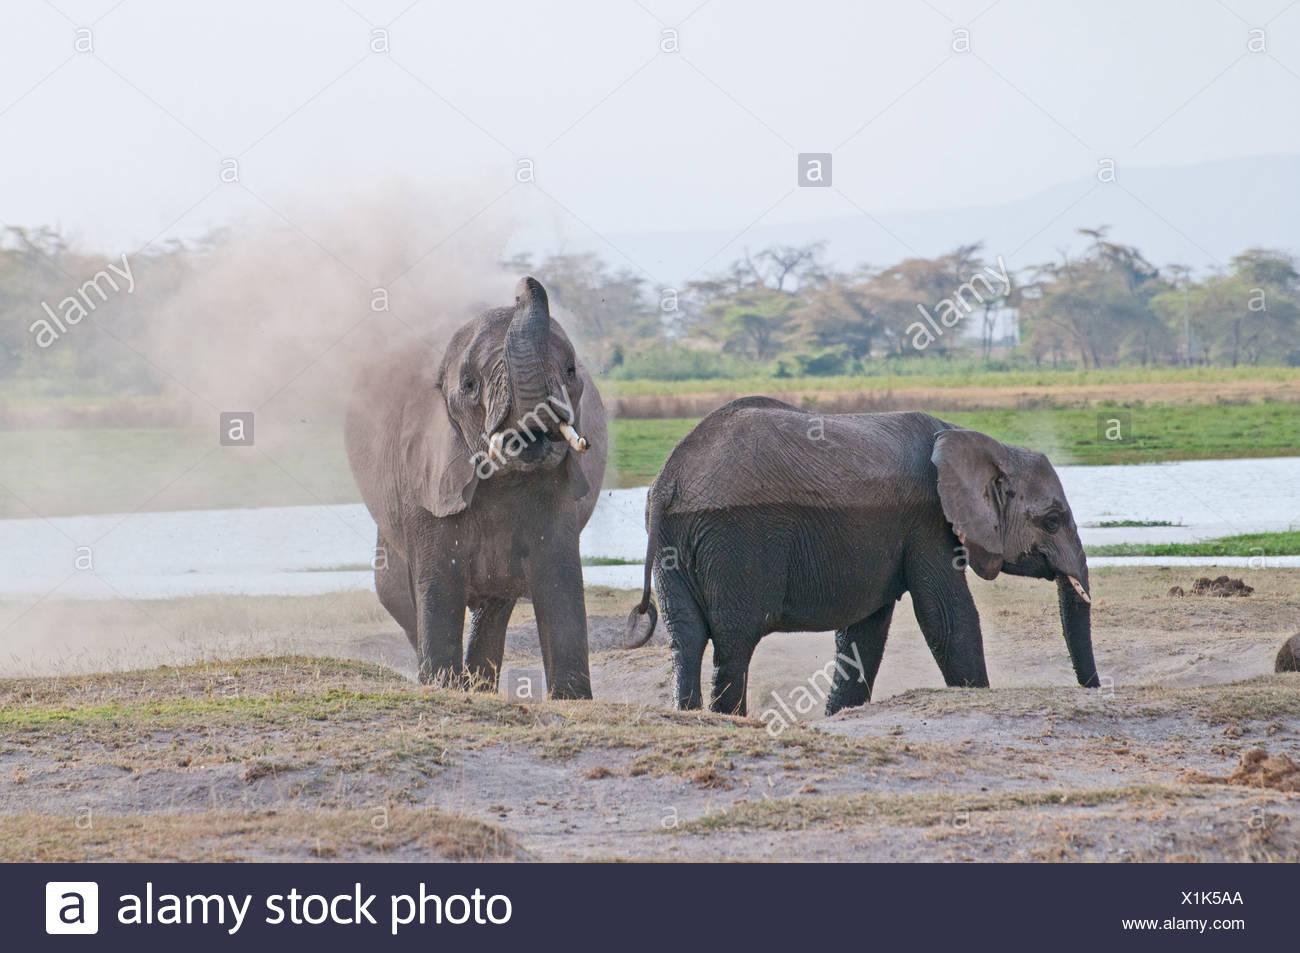 Elefanten weht Staub über sich selbst im Amboseli-Nationalpark Kenia Stockbild